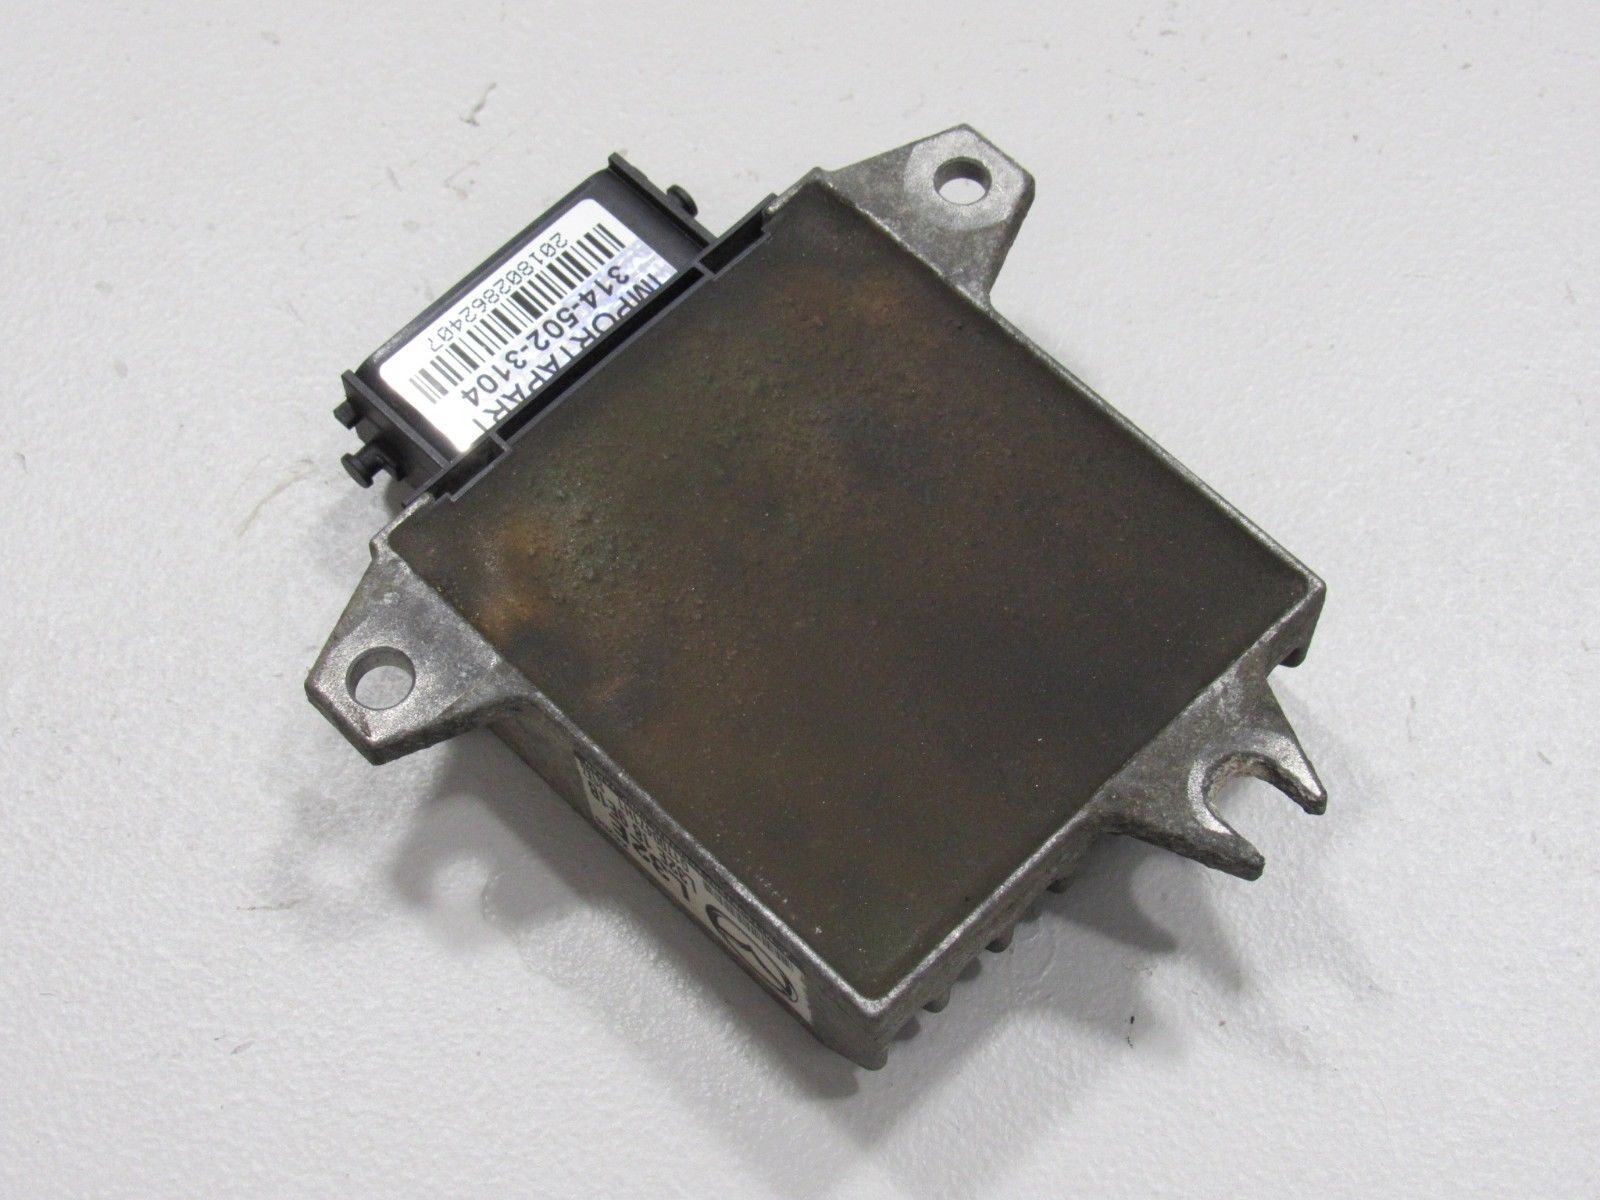 06 Mazda 3 23l At Tcu Tcm Transmission Control Module Unit L32e 18 Fuse Box Location 9e1b E Importapart